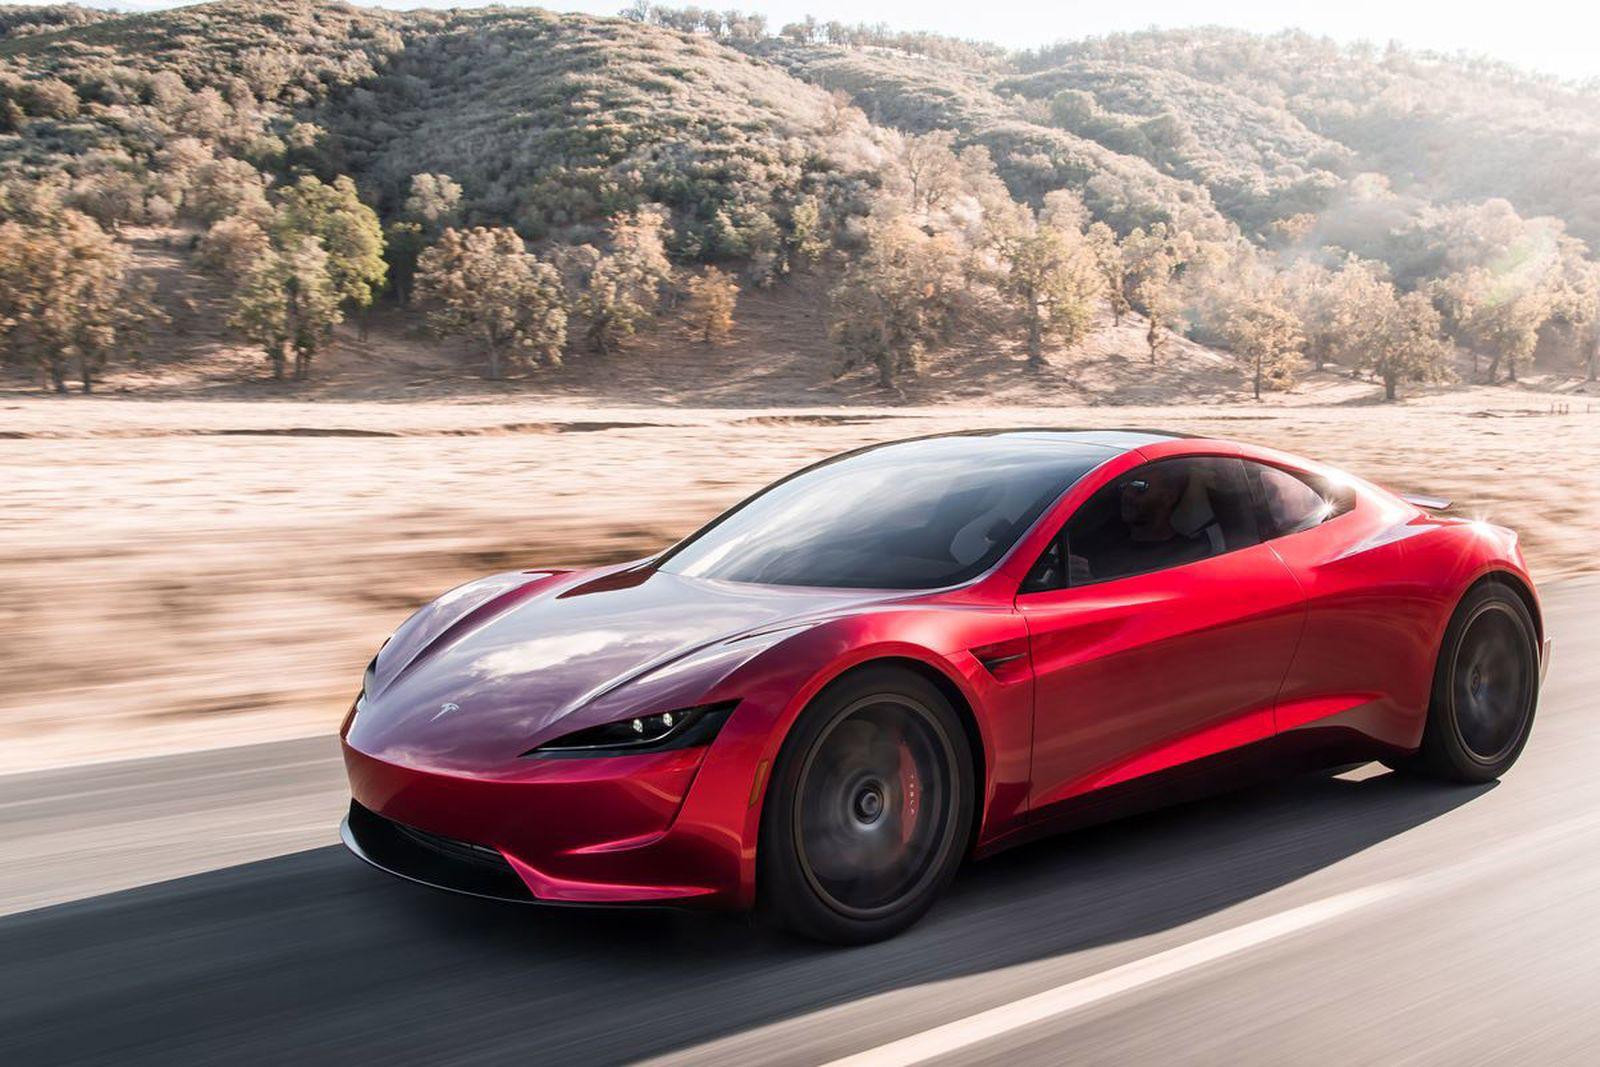 tesla summon rc car Elon Musk